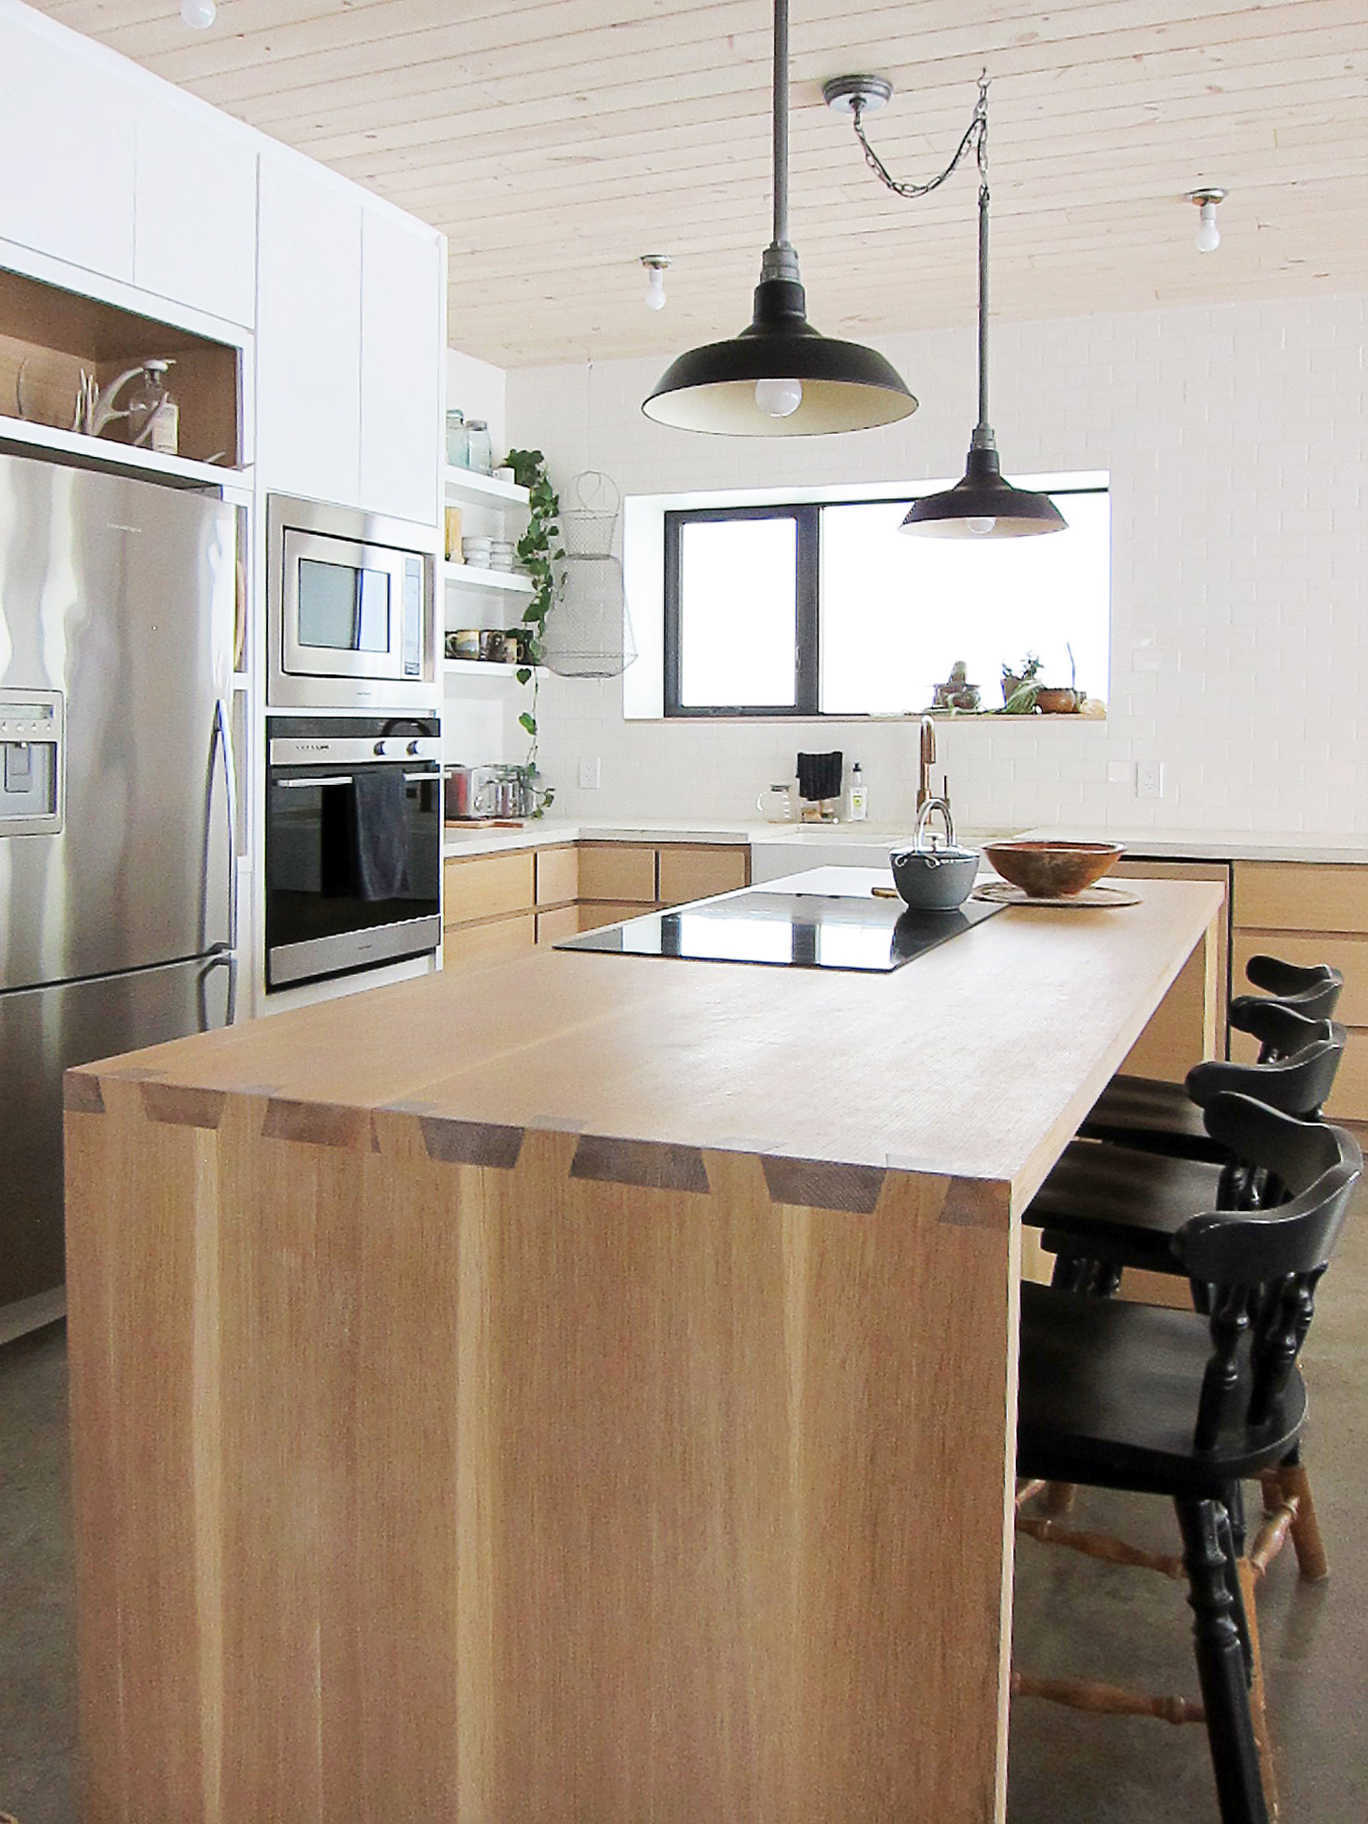 earle kitchen 3(b).jpg